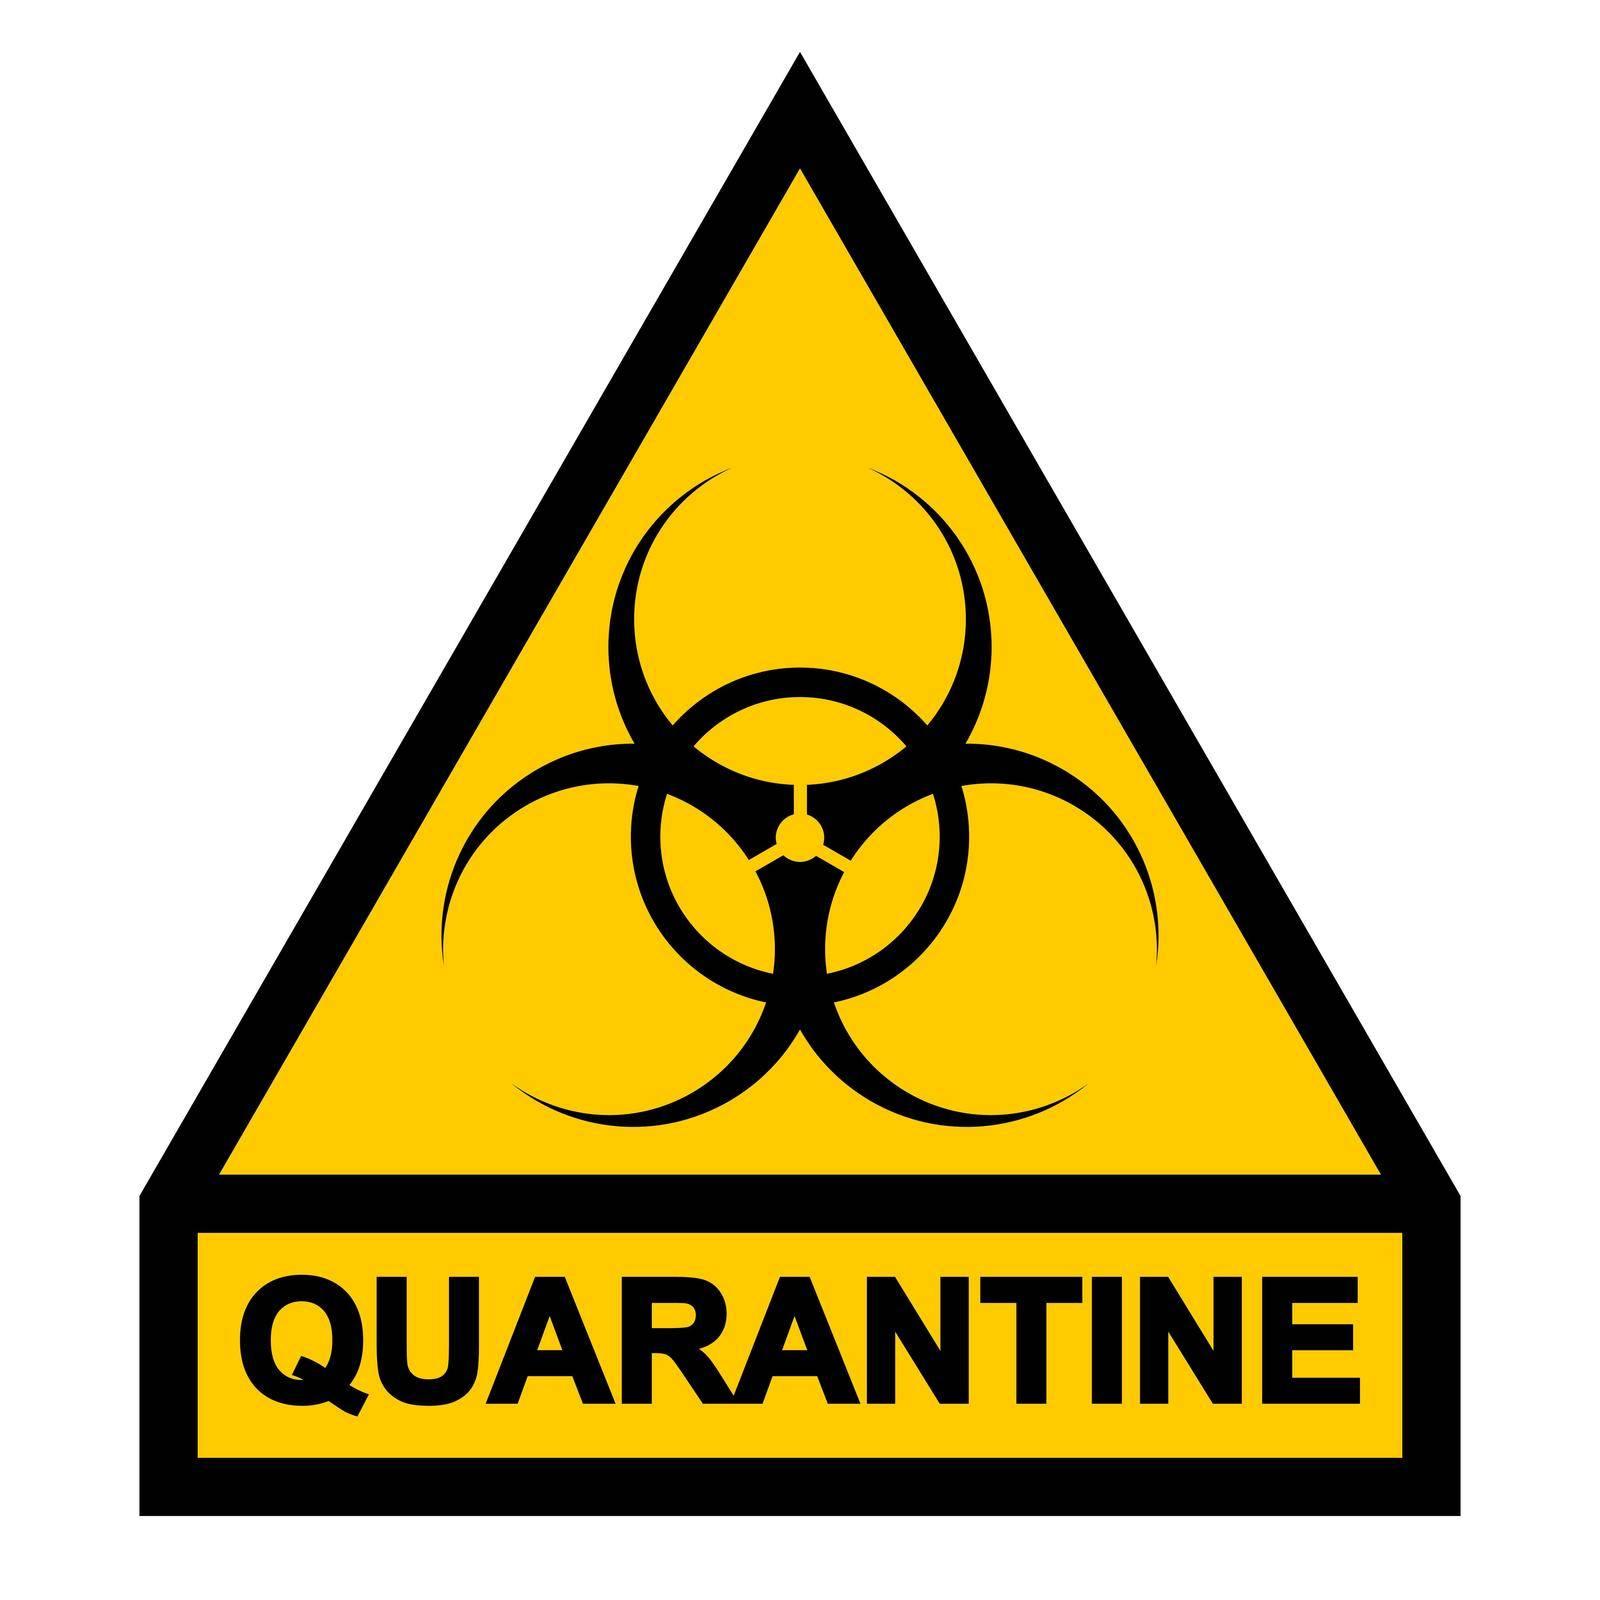 Sign symbol quarantine zone, area Stop Novel Coronavirus outbreak covid 19 2019 nCoV symptoms in Wuhan China, vector quarantine biohazard Sign biological activity threat alert by koksikoks